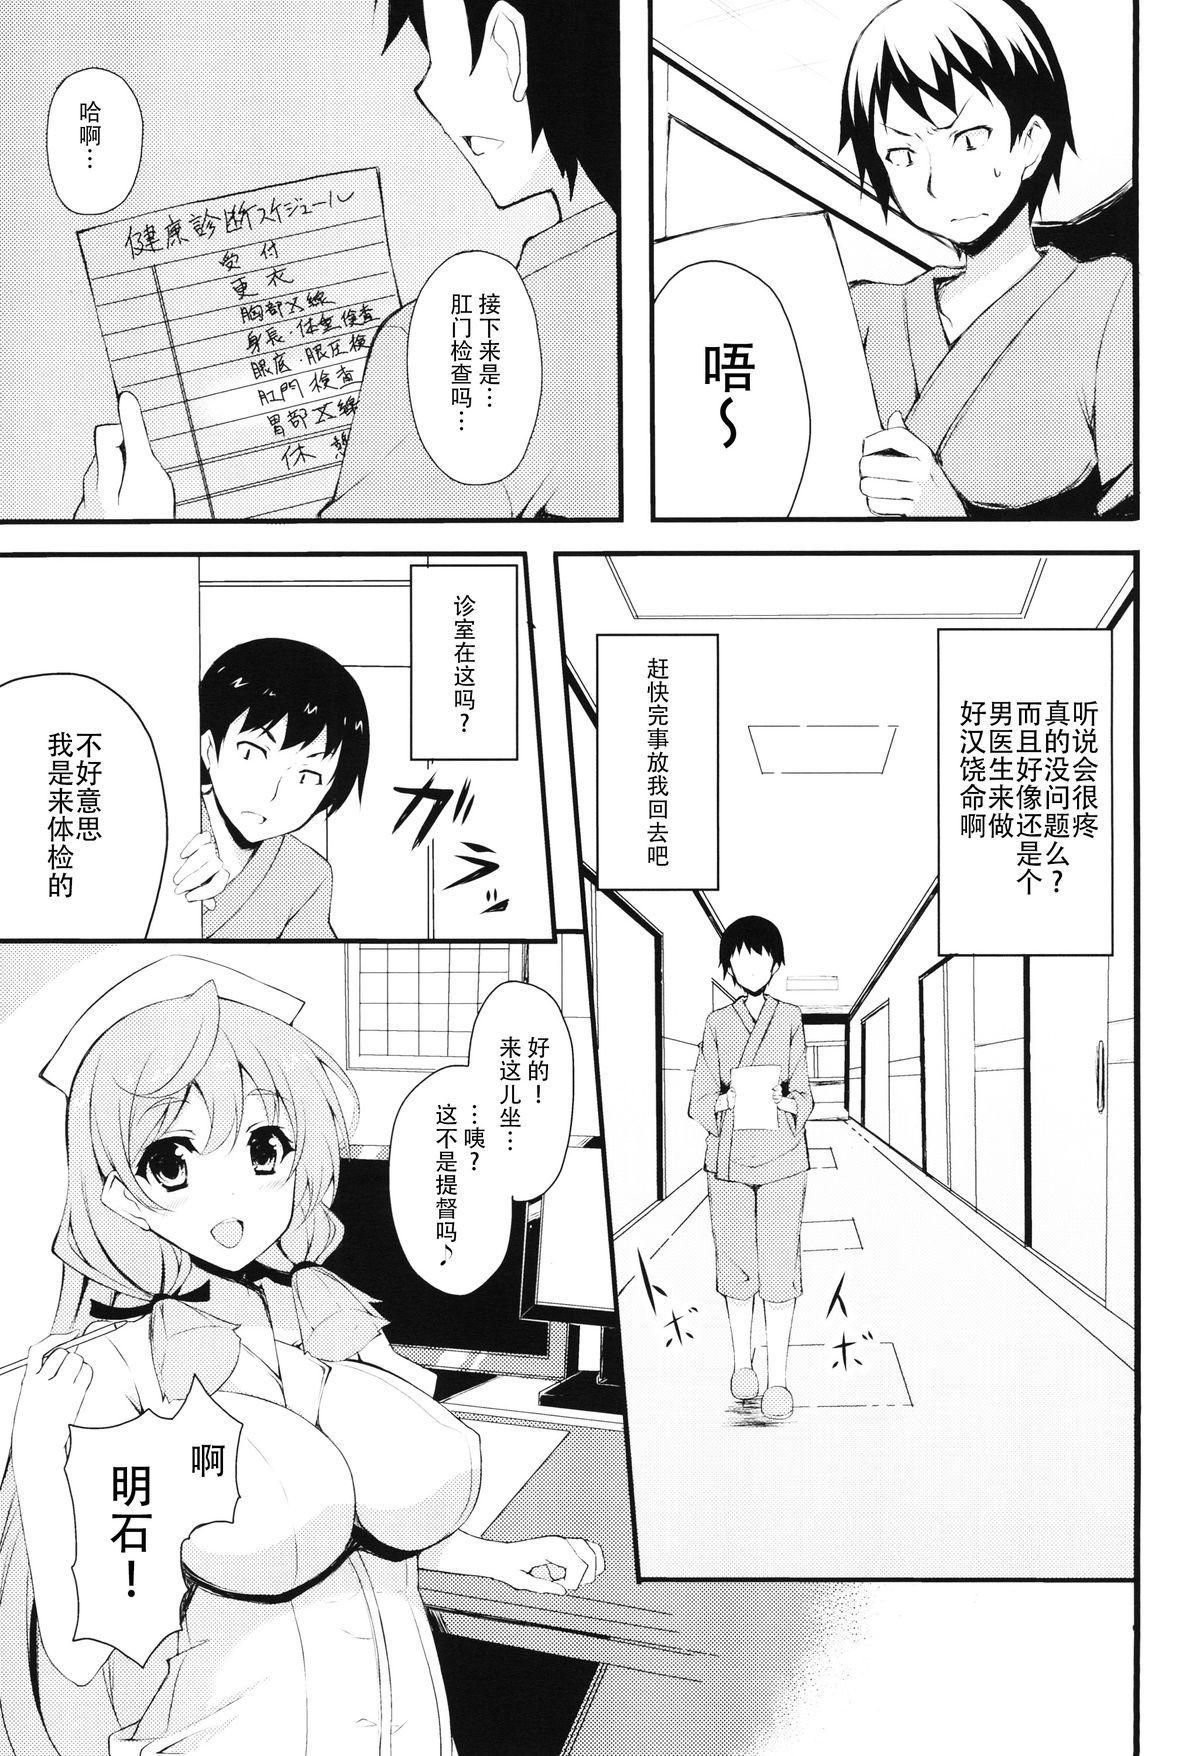 Akashi-san to Kenkou Shindan 2